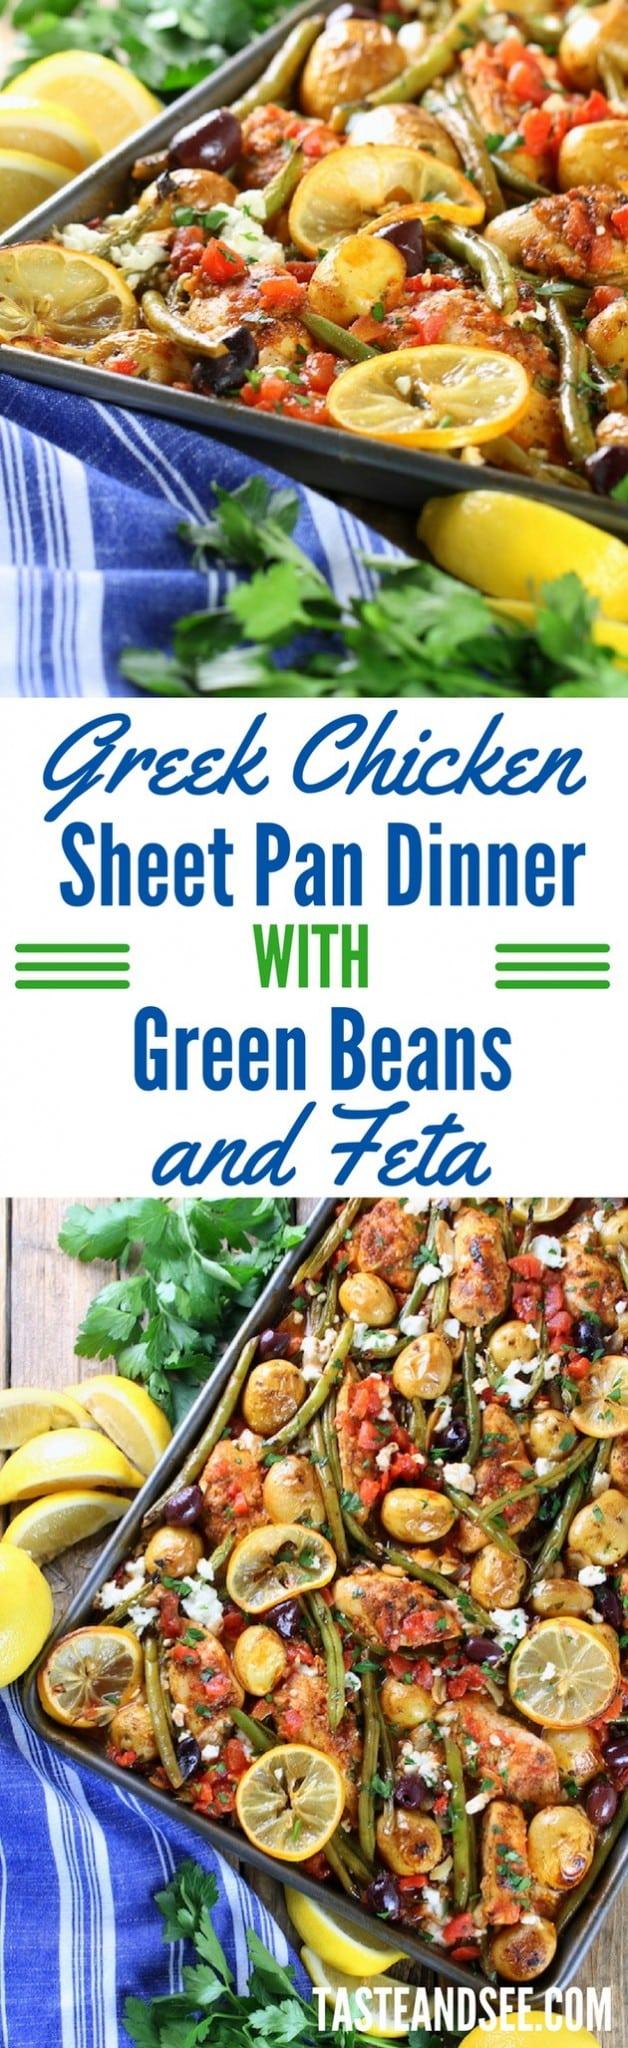 Greek Chicken Sheet Pan Dinner with Green Beans and Feta!  Mediterranean | Gluten-Free | Easy!  #dinner #sheetpan #greek #recipes #mealprep #healthy #tasteandsee  || https://tasteandsee.com ||